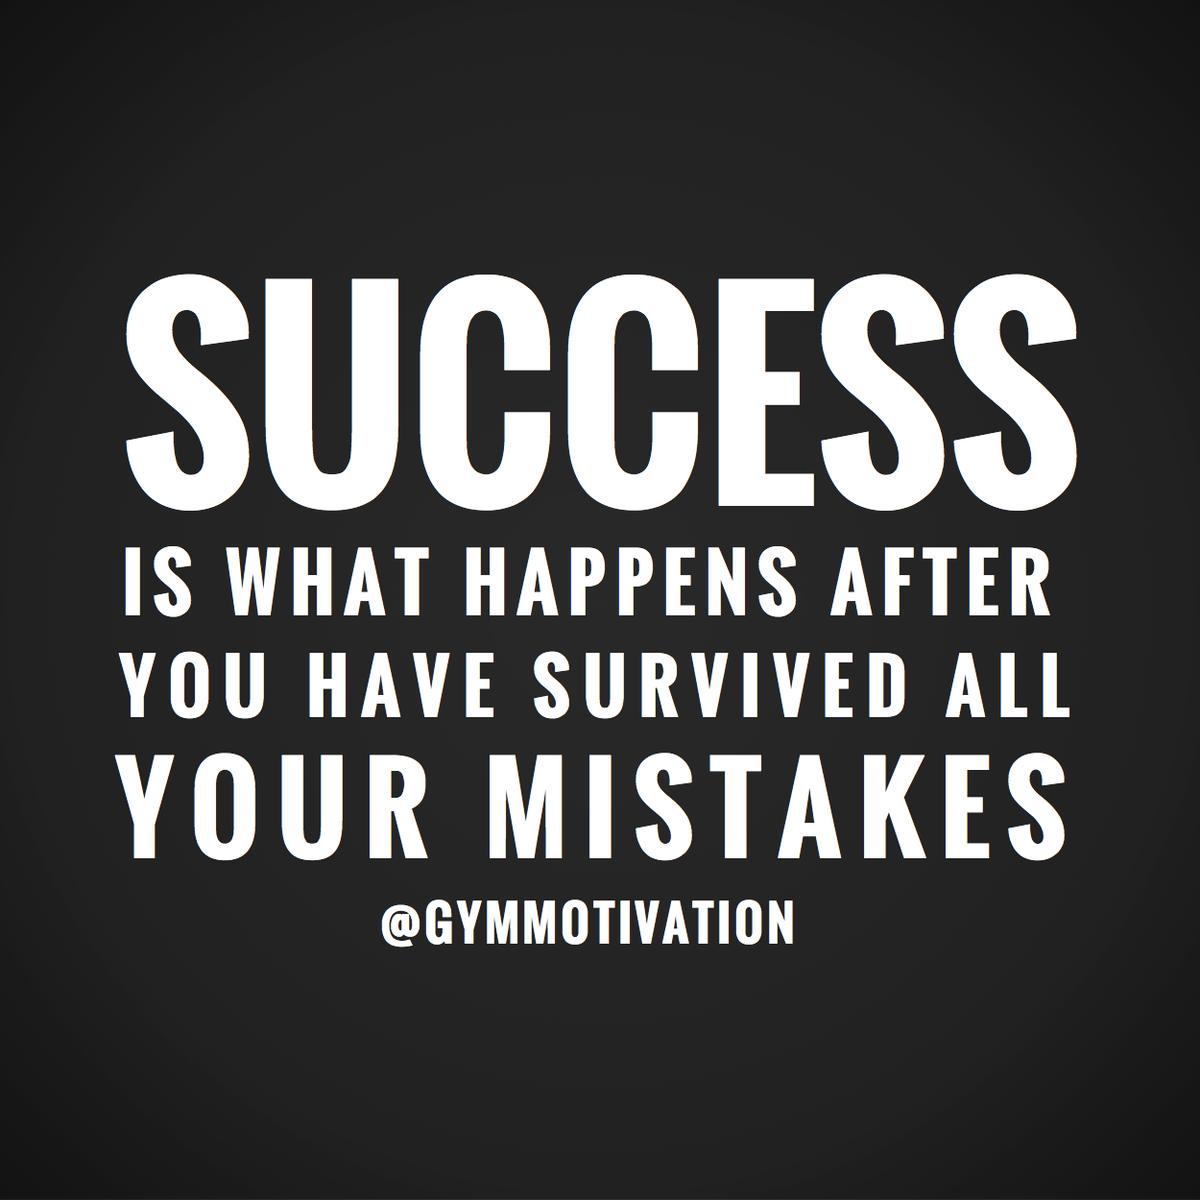 Gym Motivation (@GymMotivation) | Twitter